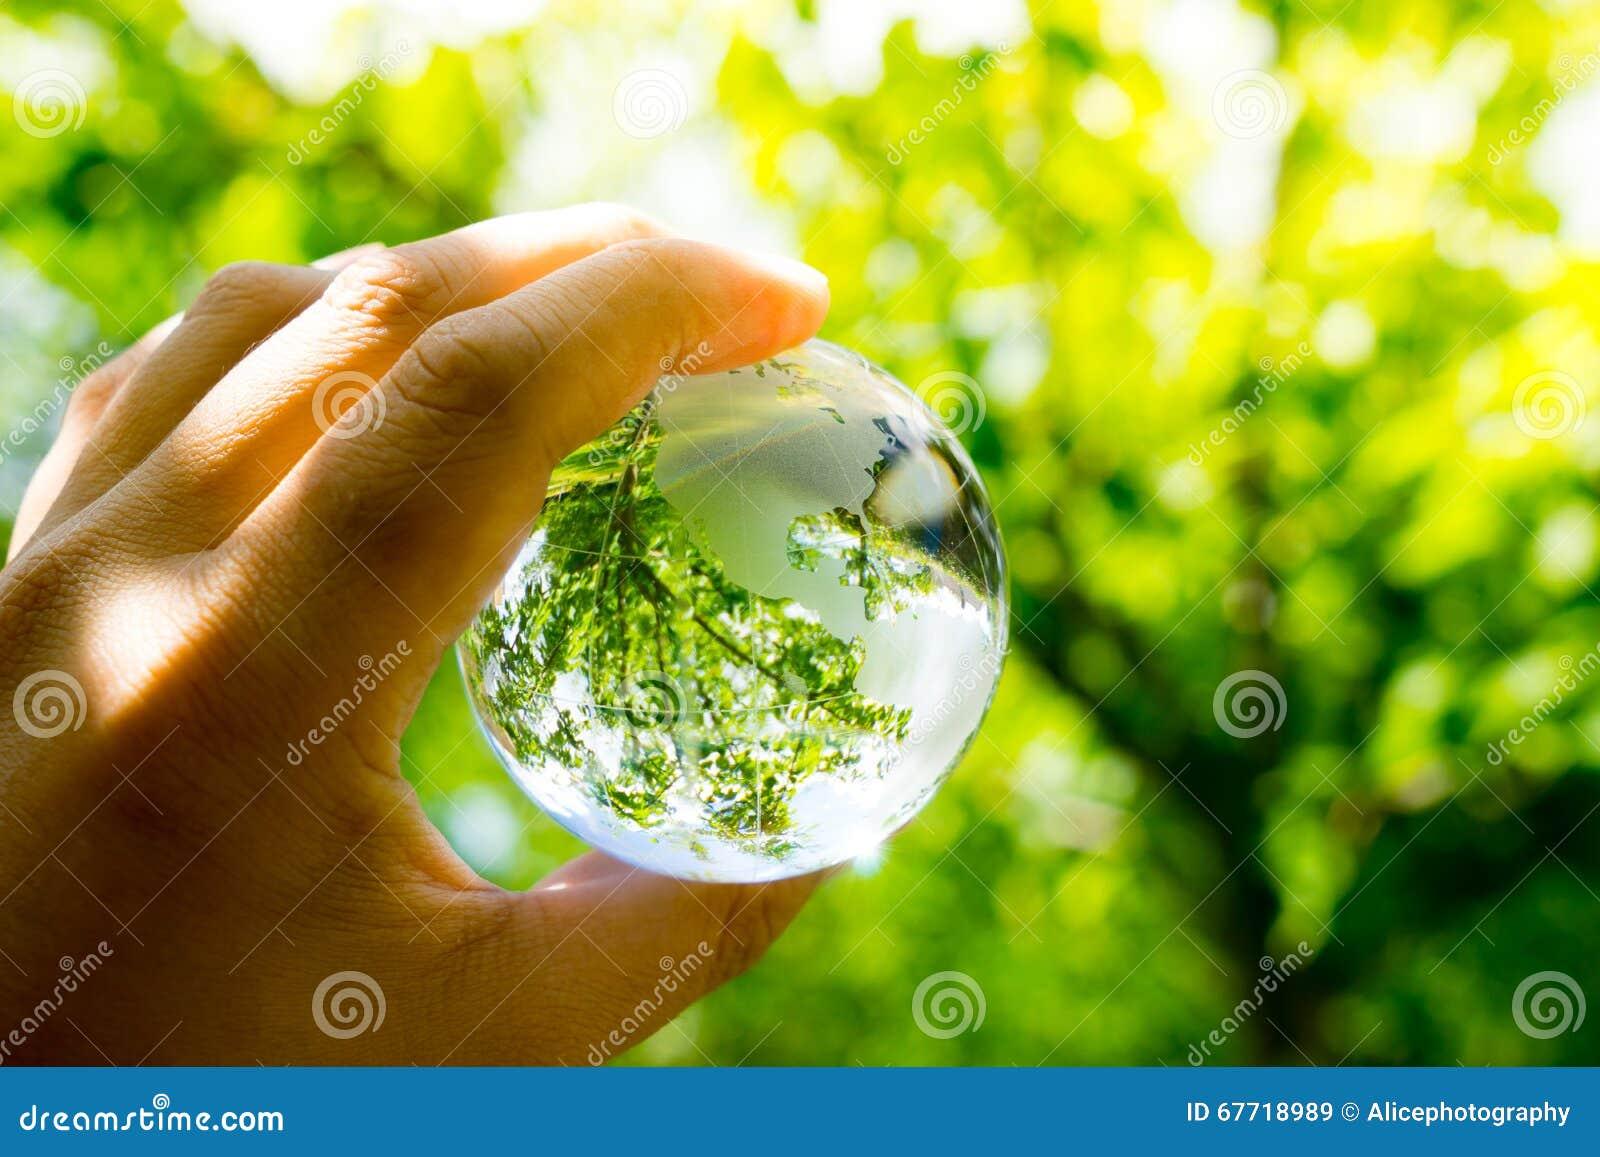 Groen & Eco-milieu, glasbol in de tuin